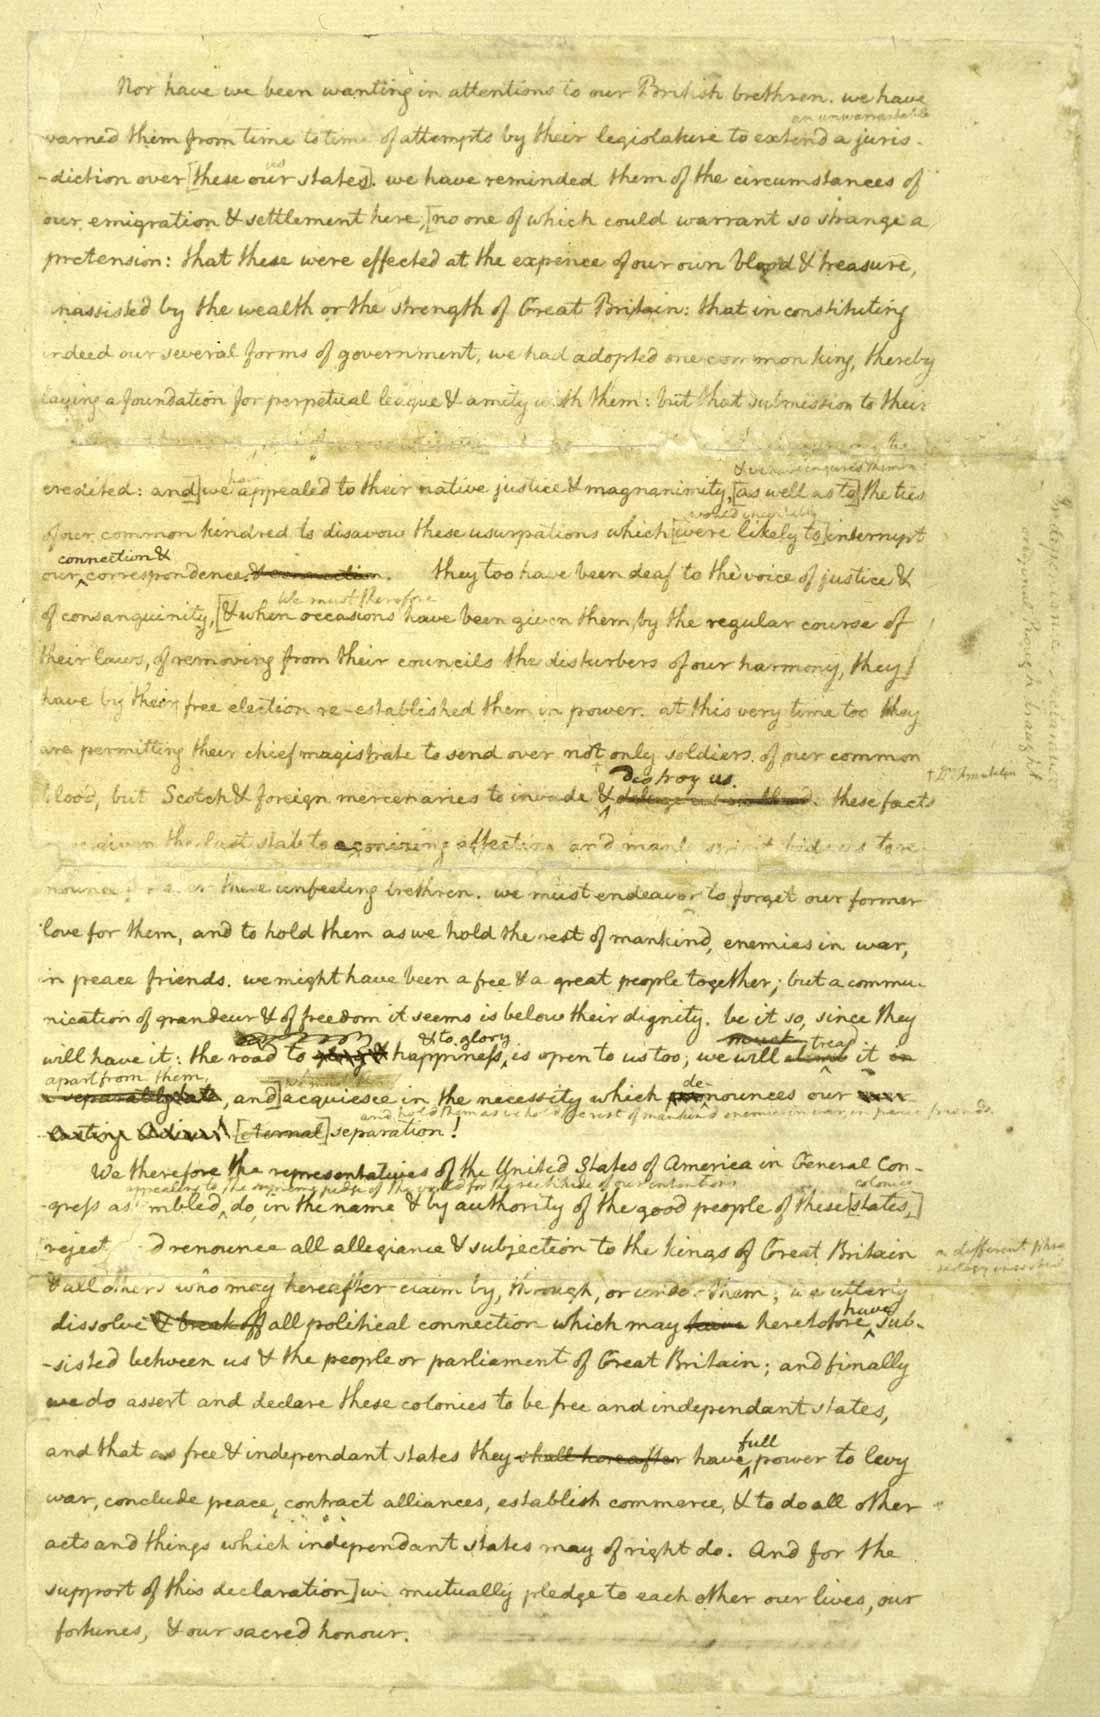 Ben Franklin Notations On The Declaration Draft